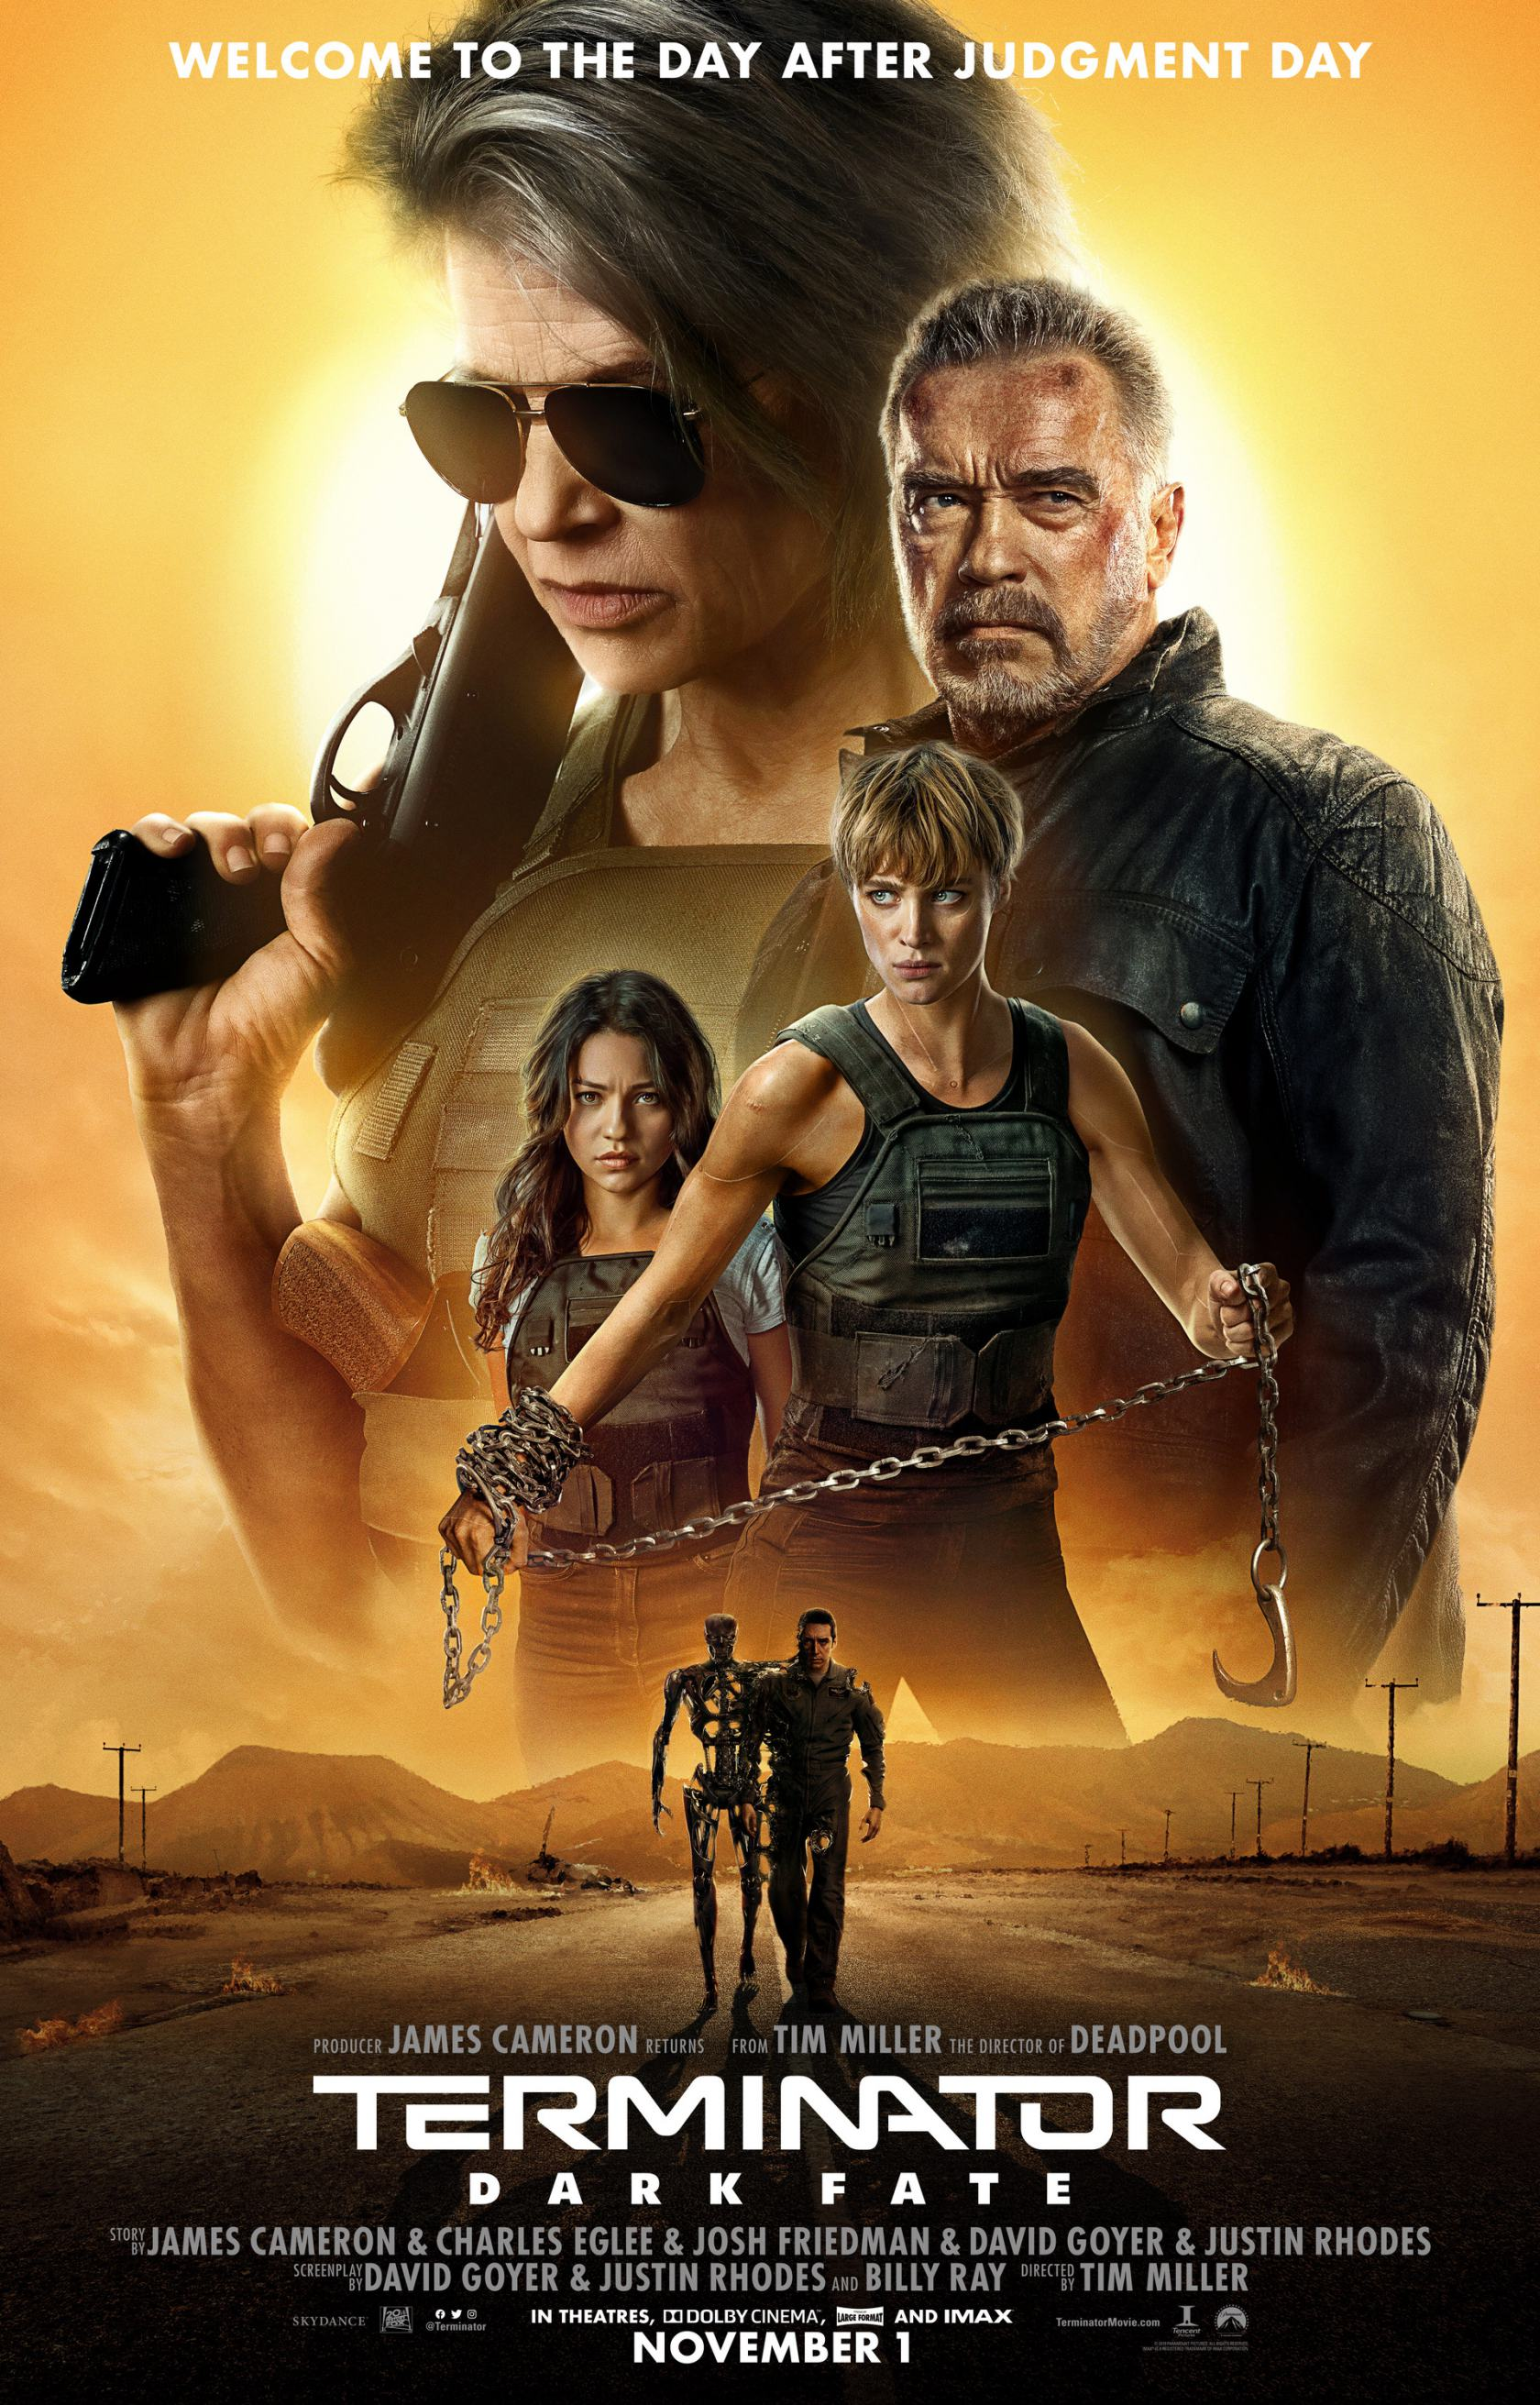 Terminator: Dark Fate Poster #2